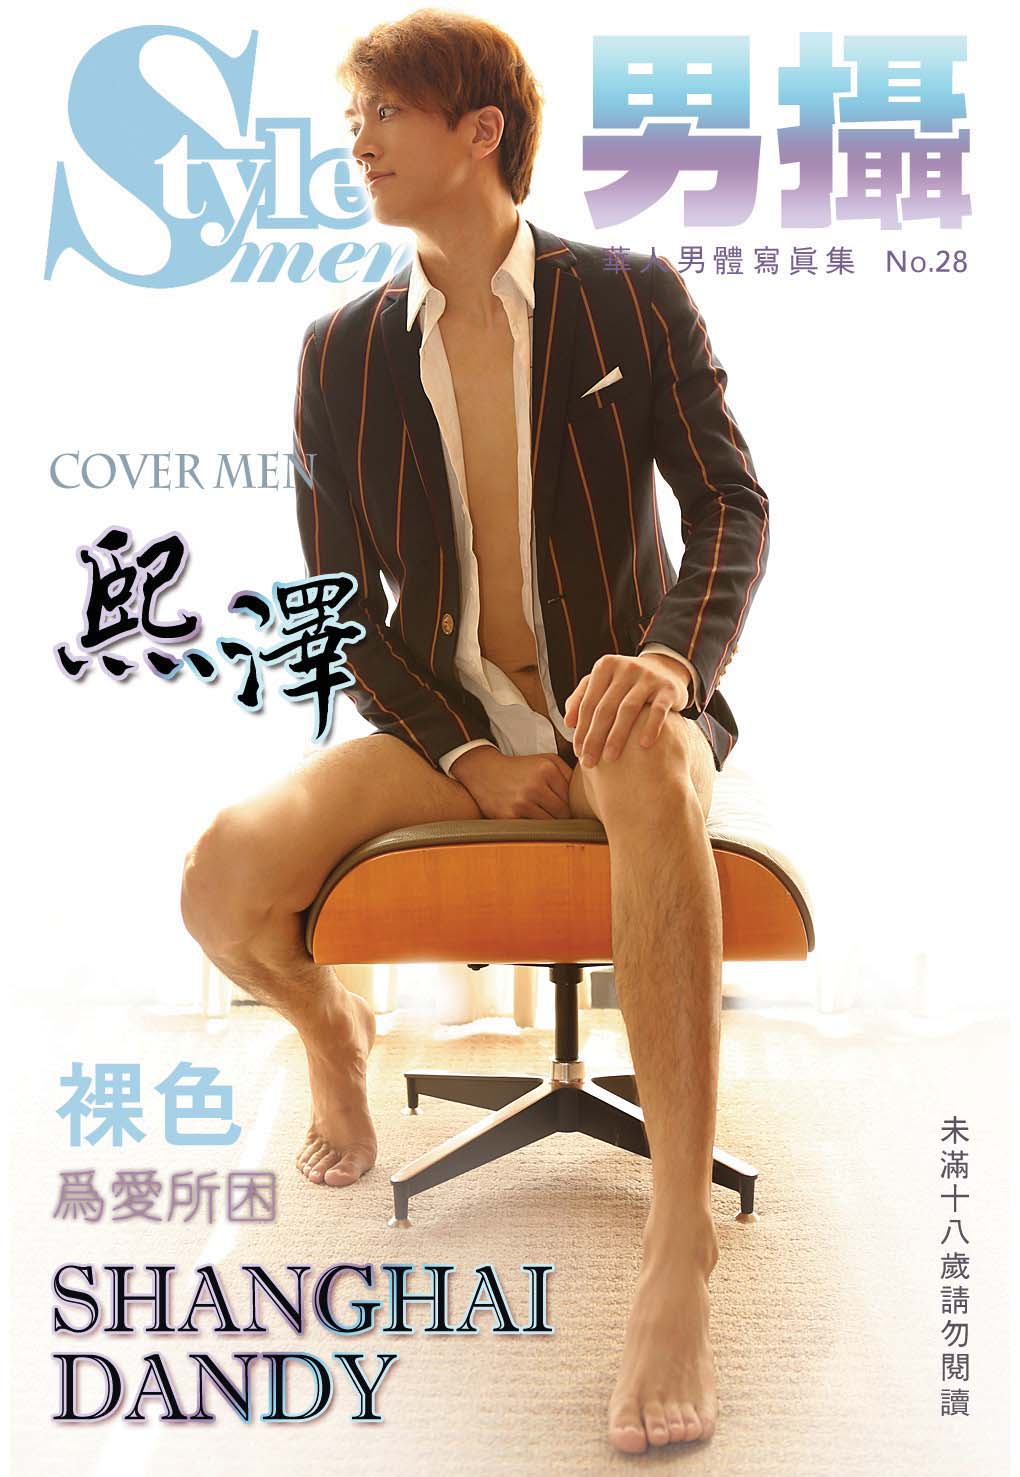 Style Men 28